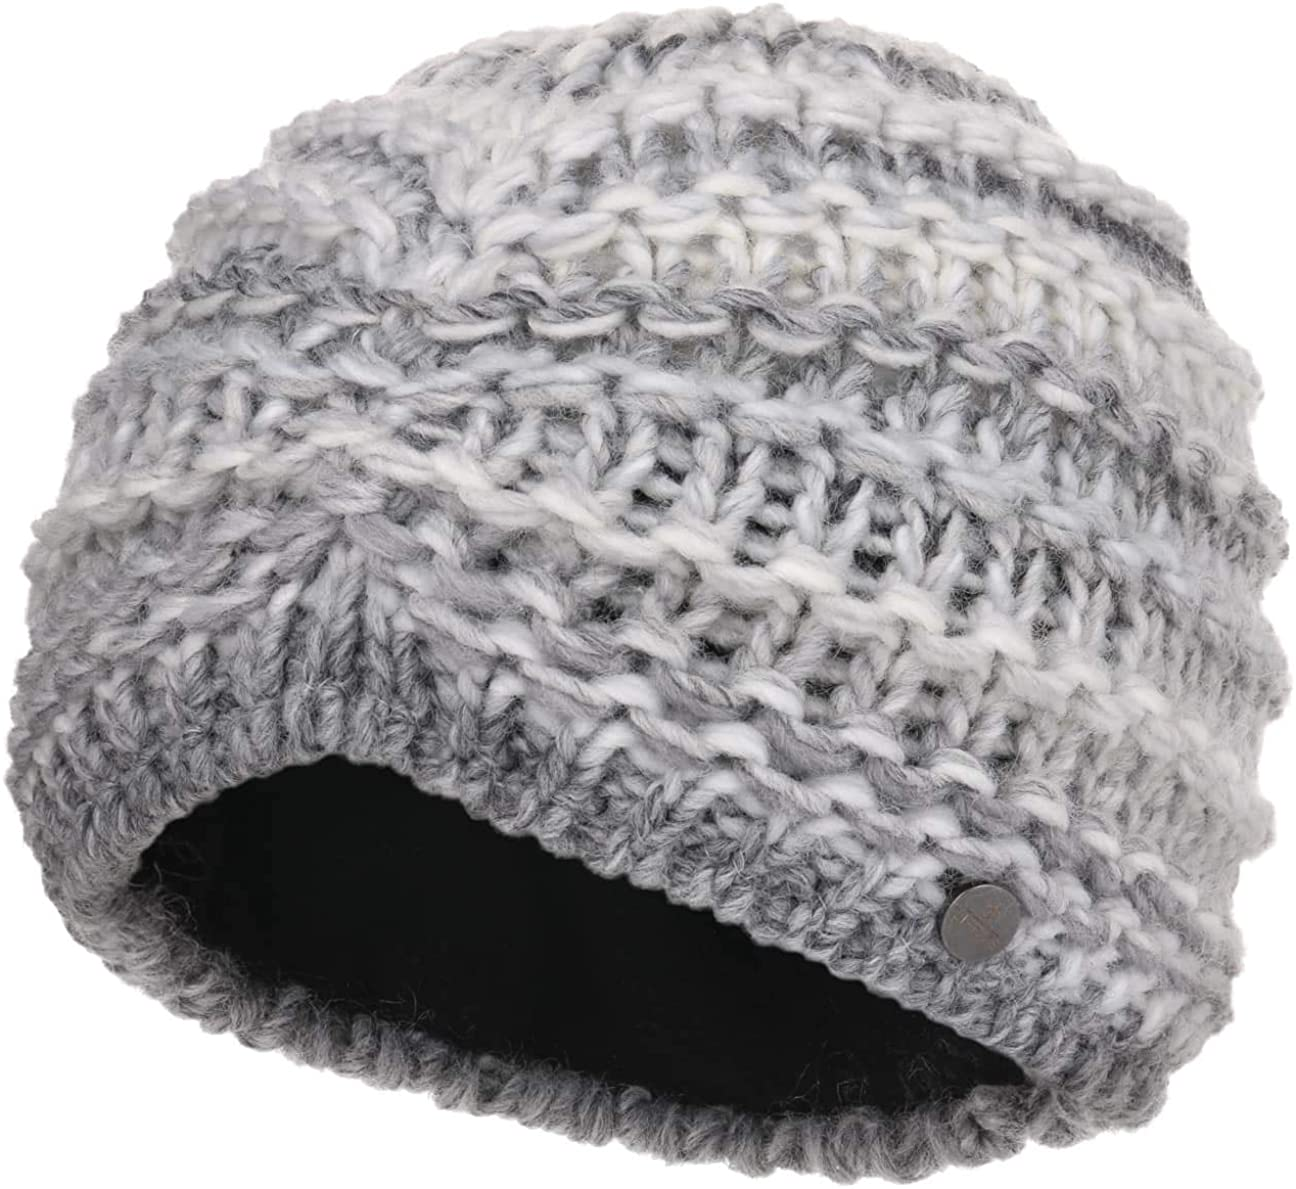 Lierys Alesund Knit Turban Women Made 海外限定 売買 Germany in -